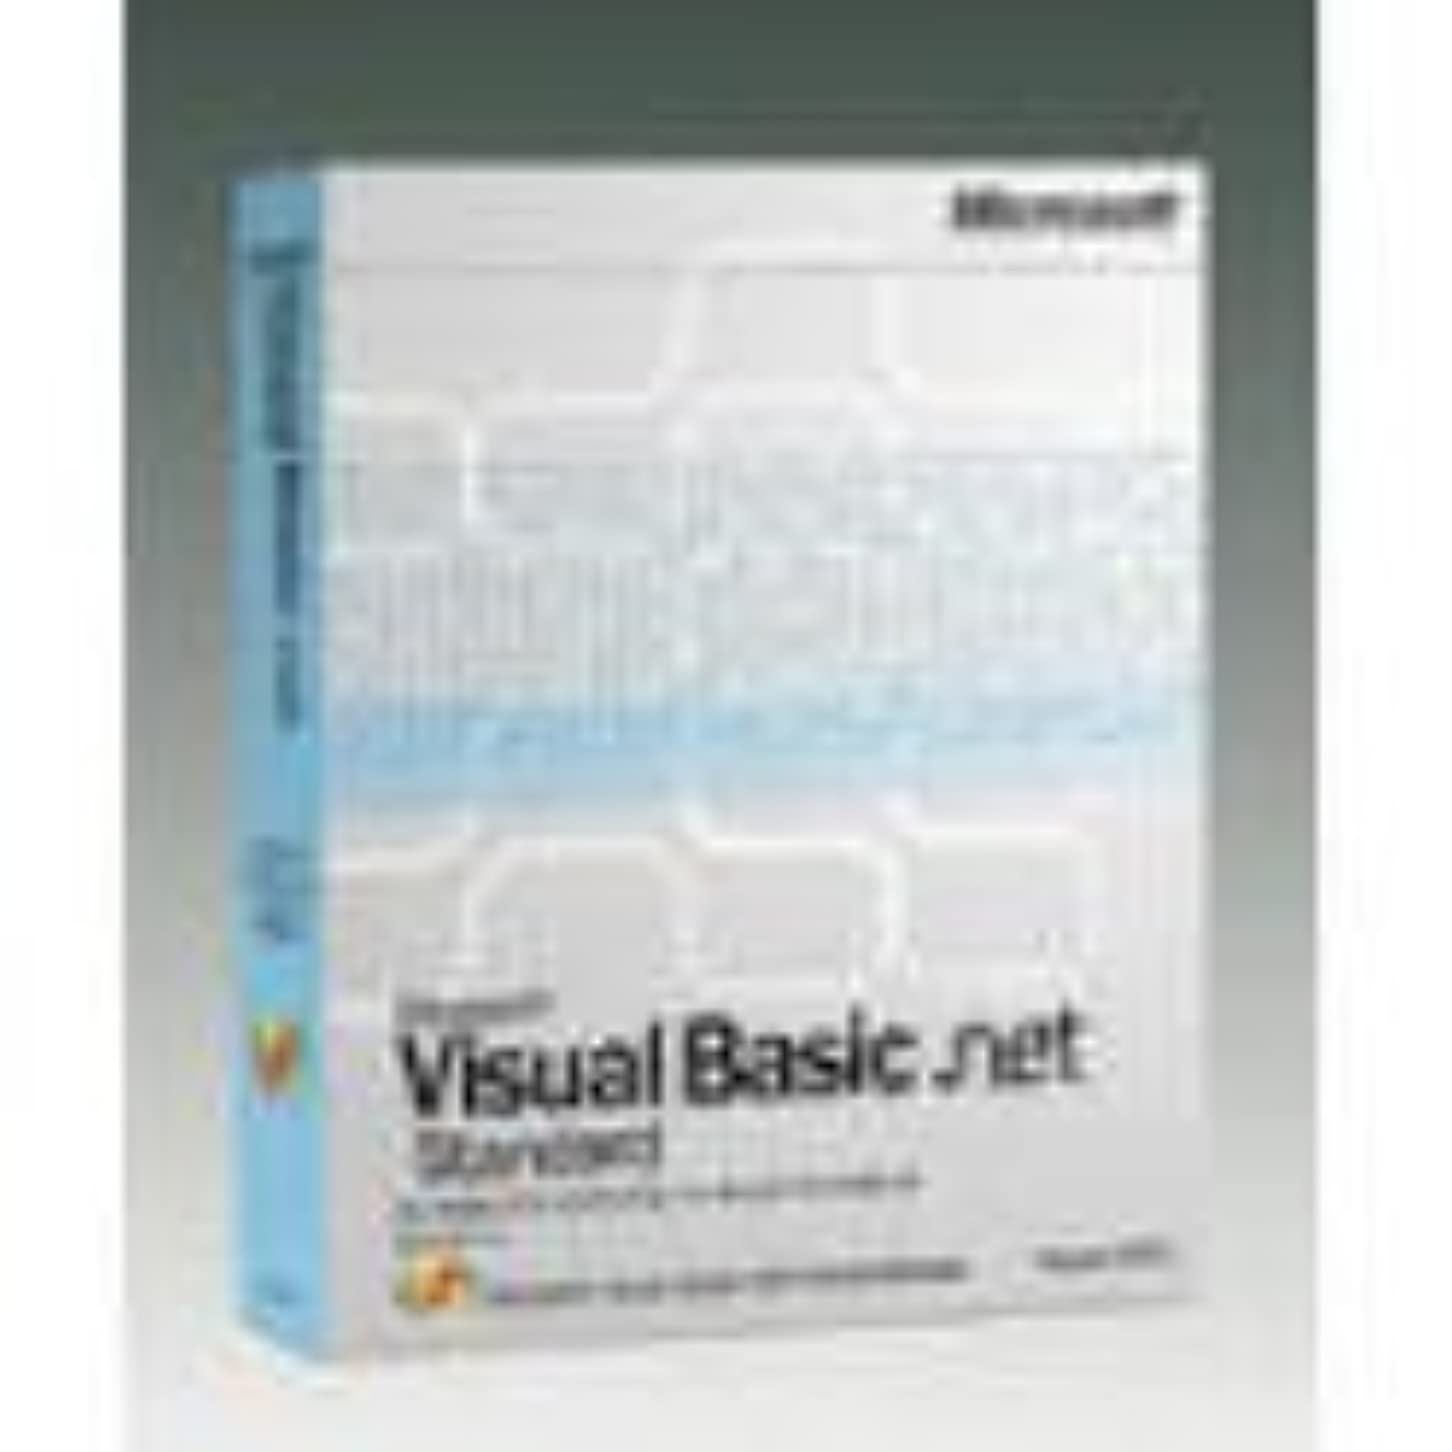 Microsoft Visual Basic .NET Standard Version 2002